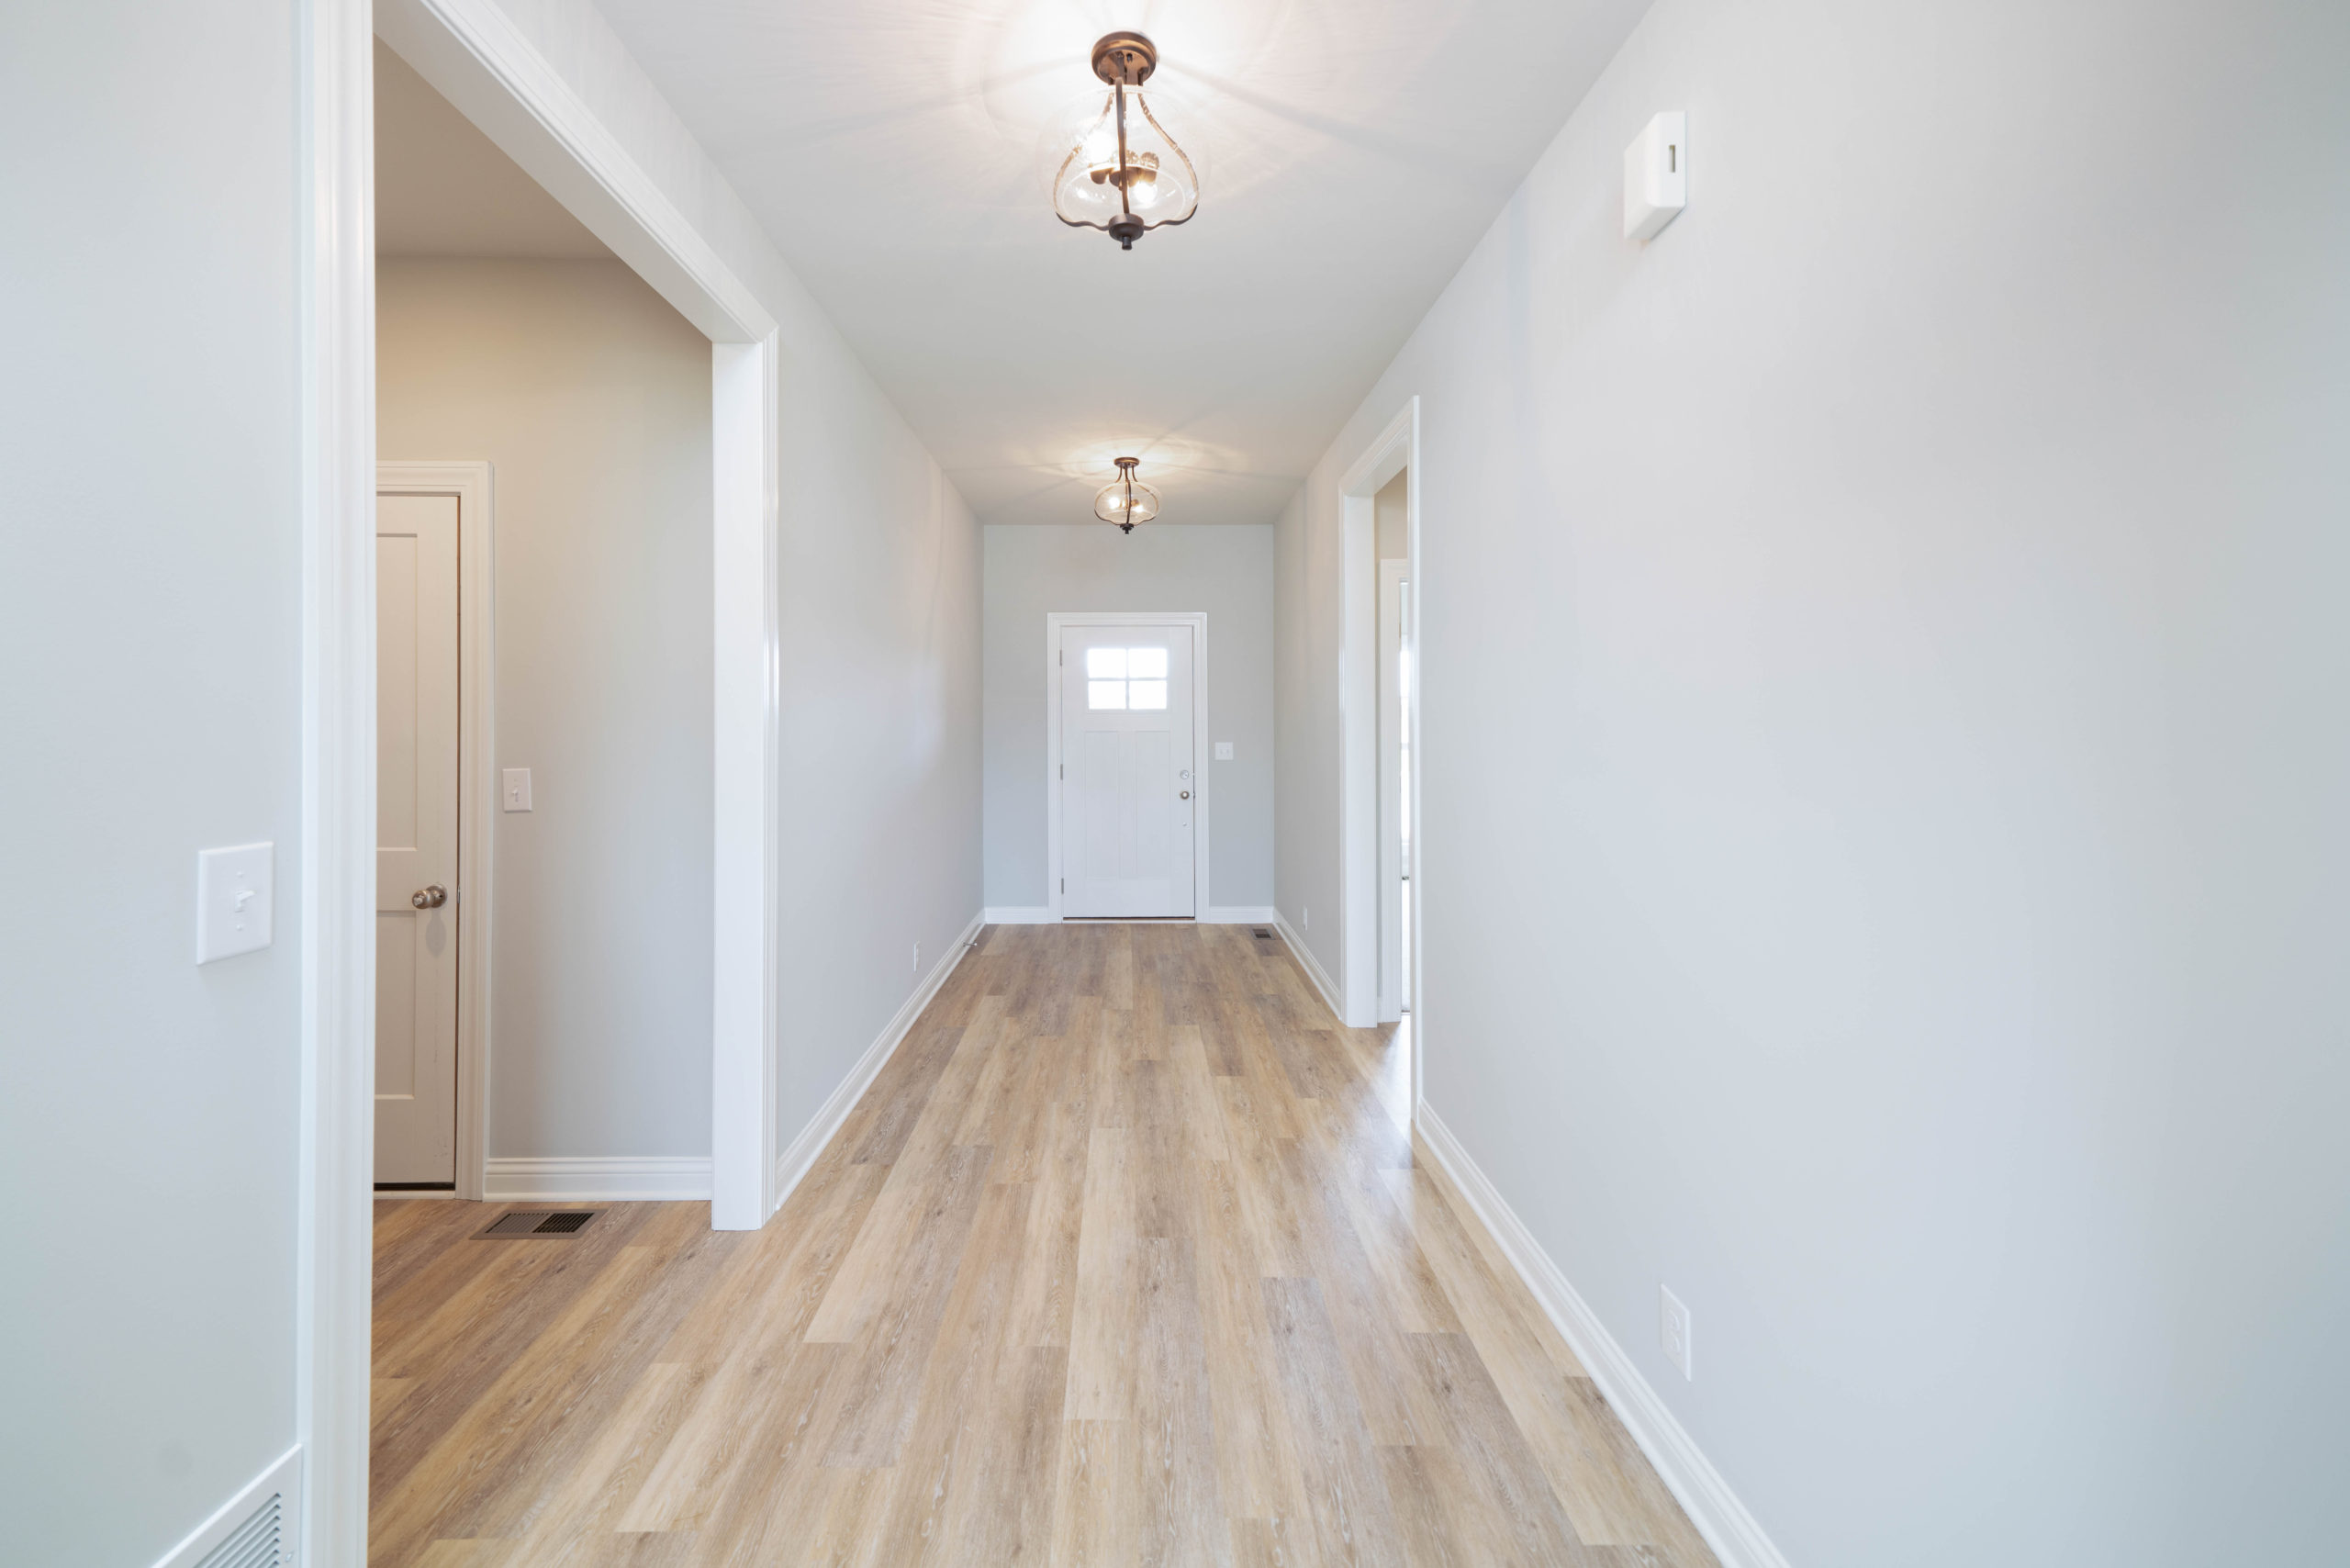 hallway with custom lighting and light hardwood floors